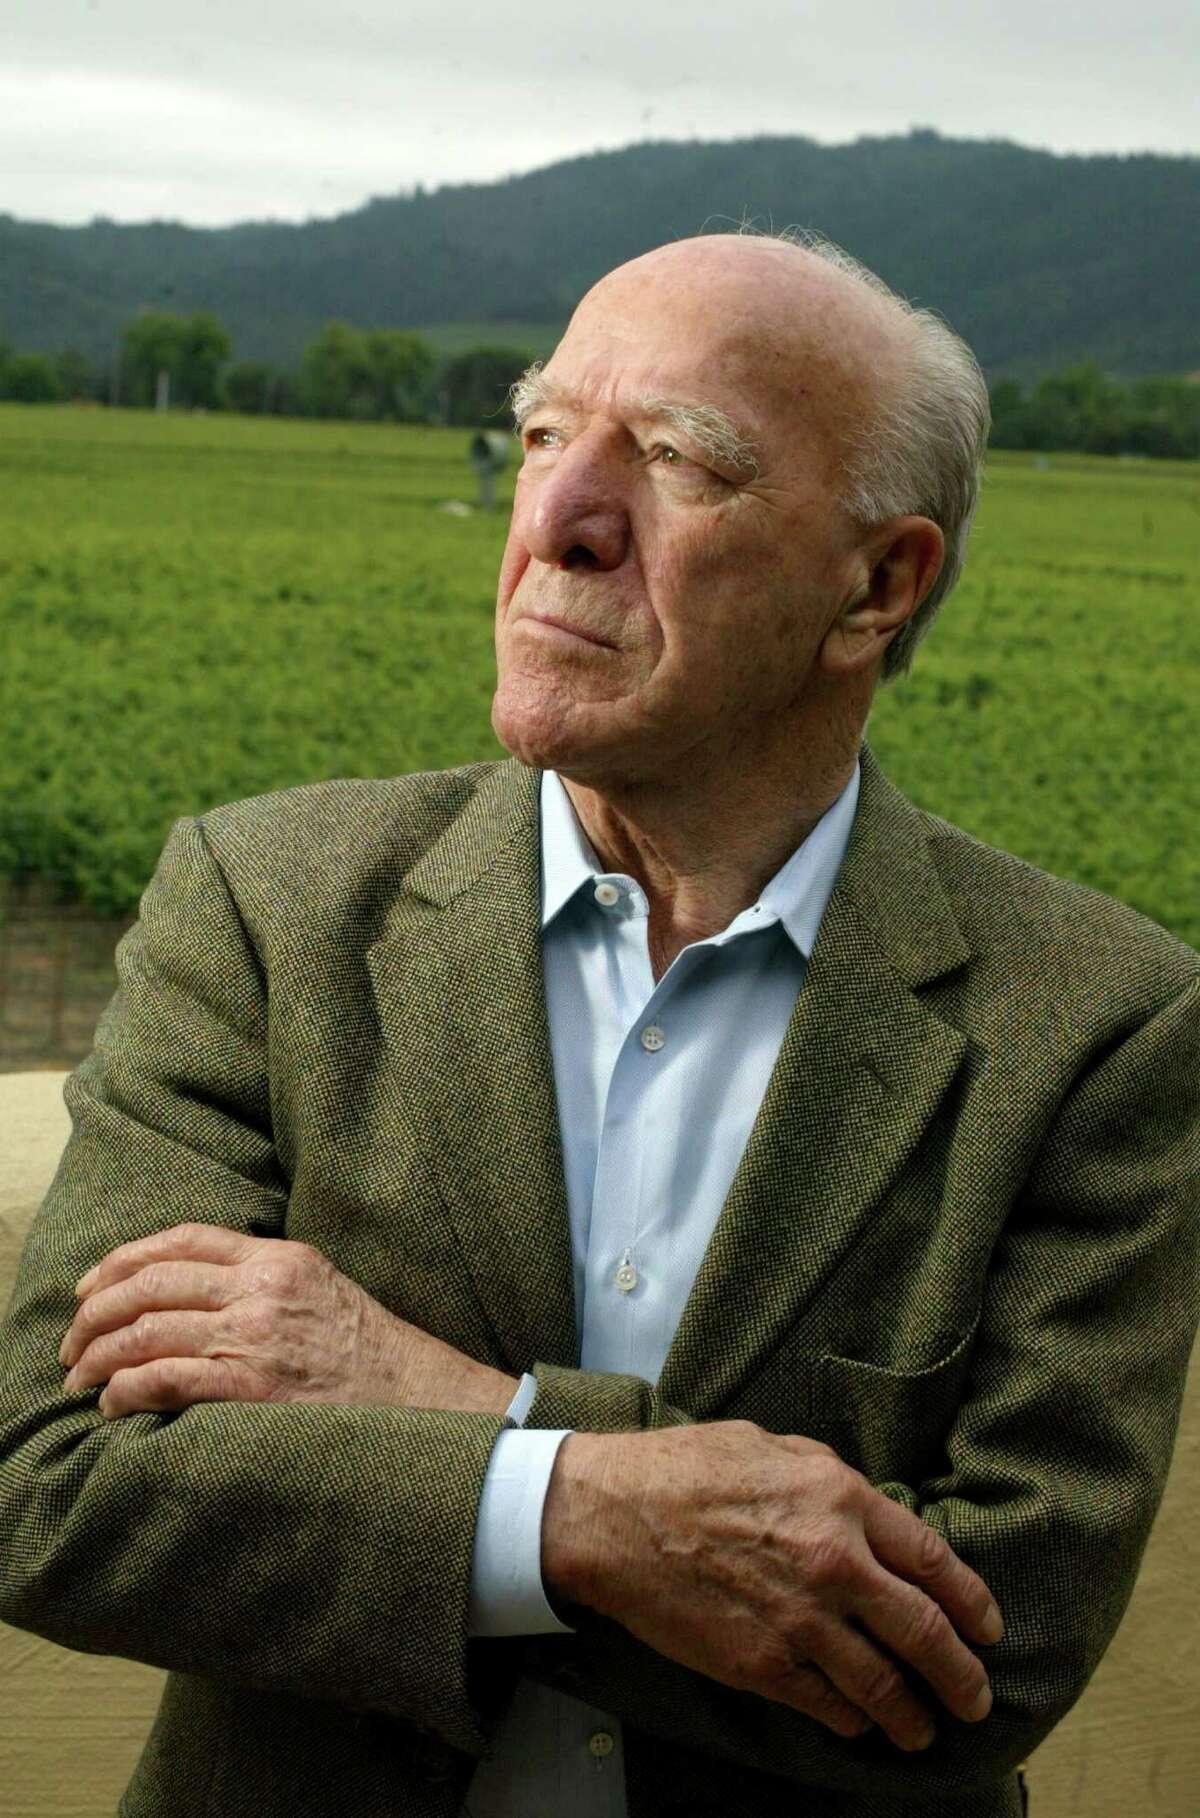 Robert Mondavi in 2003